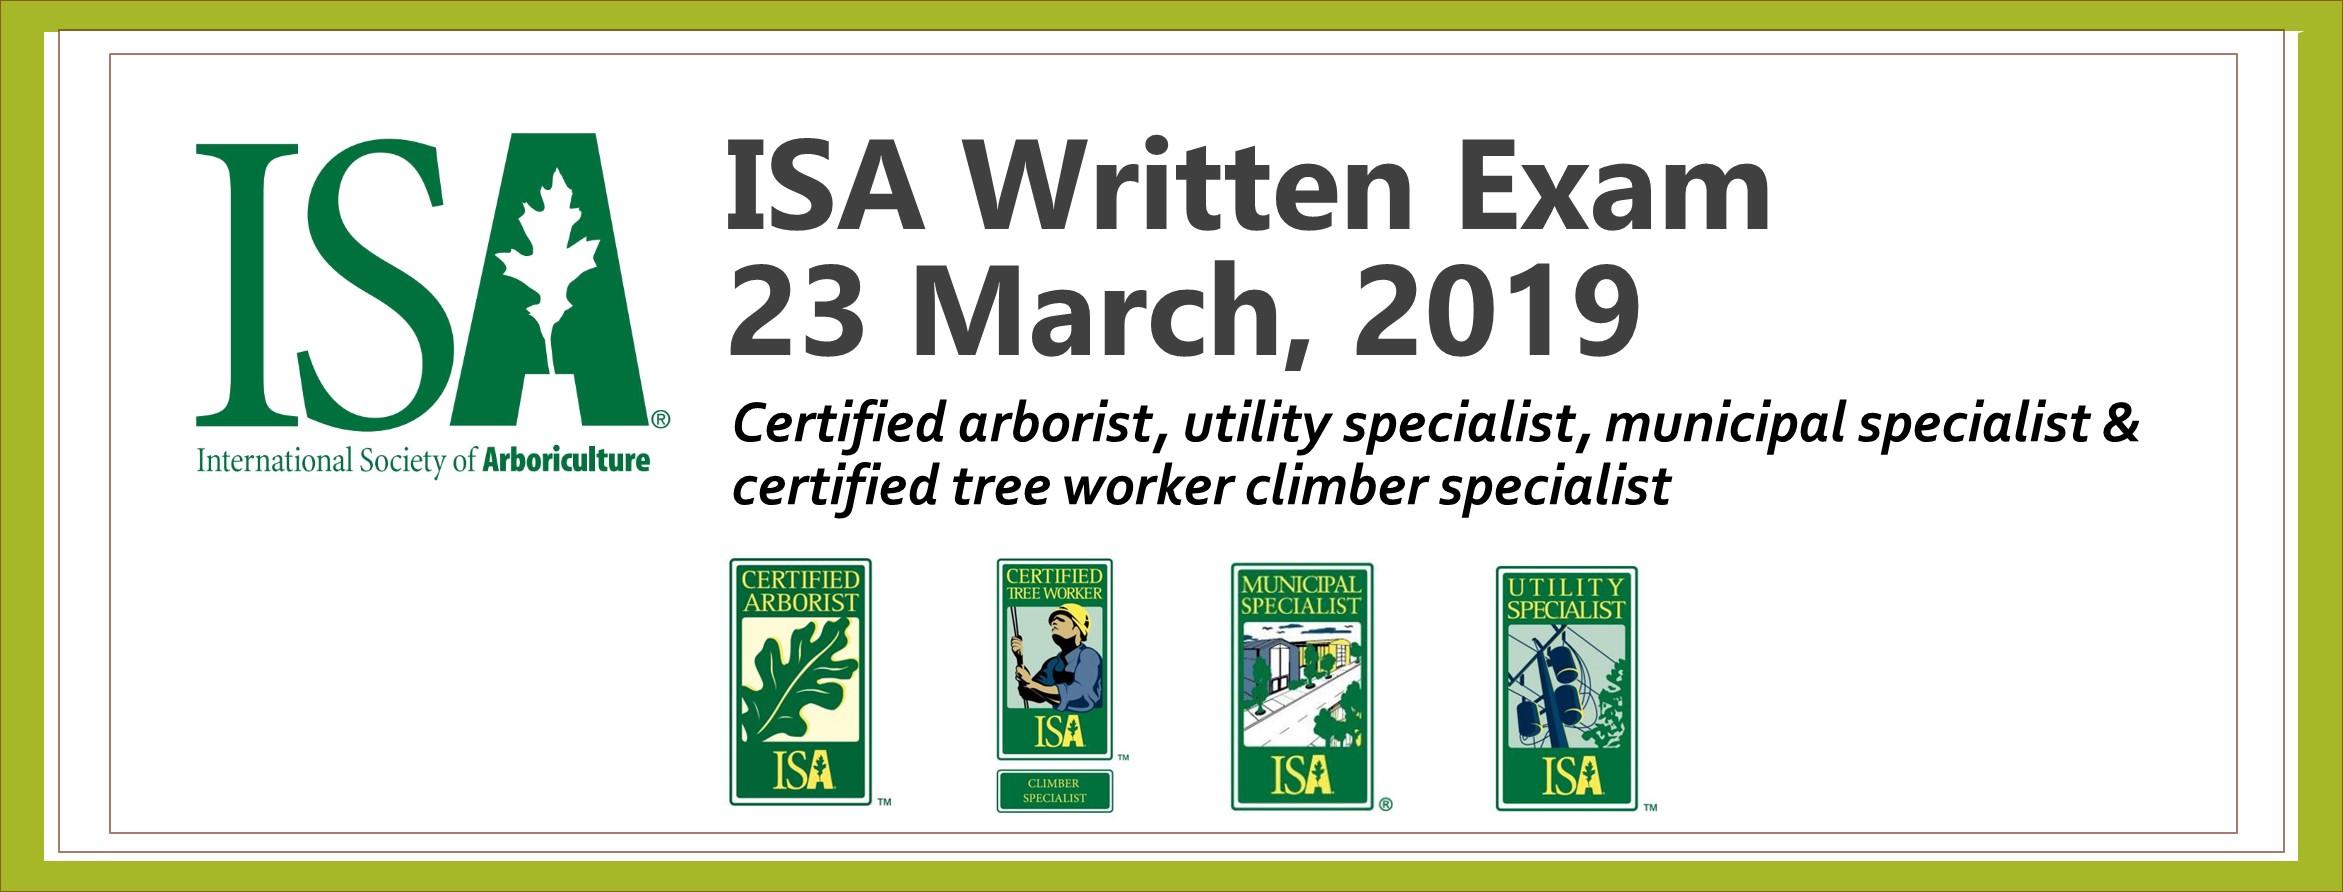 Isa Hong Kong Chapter Certified Arborist Cetified Tree Worker Climber